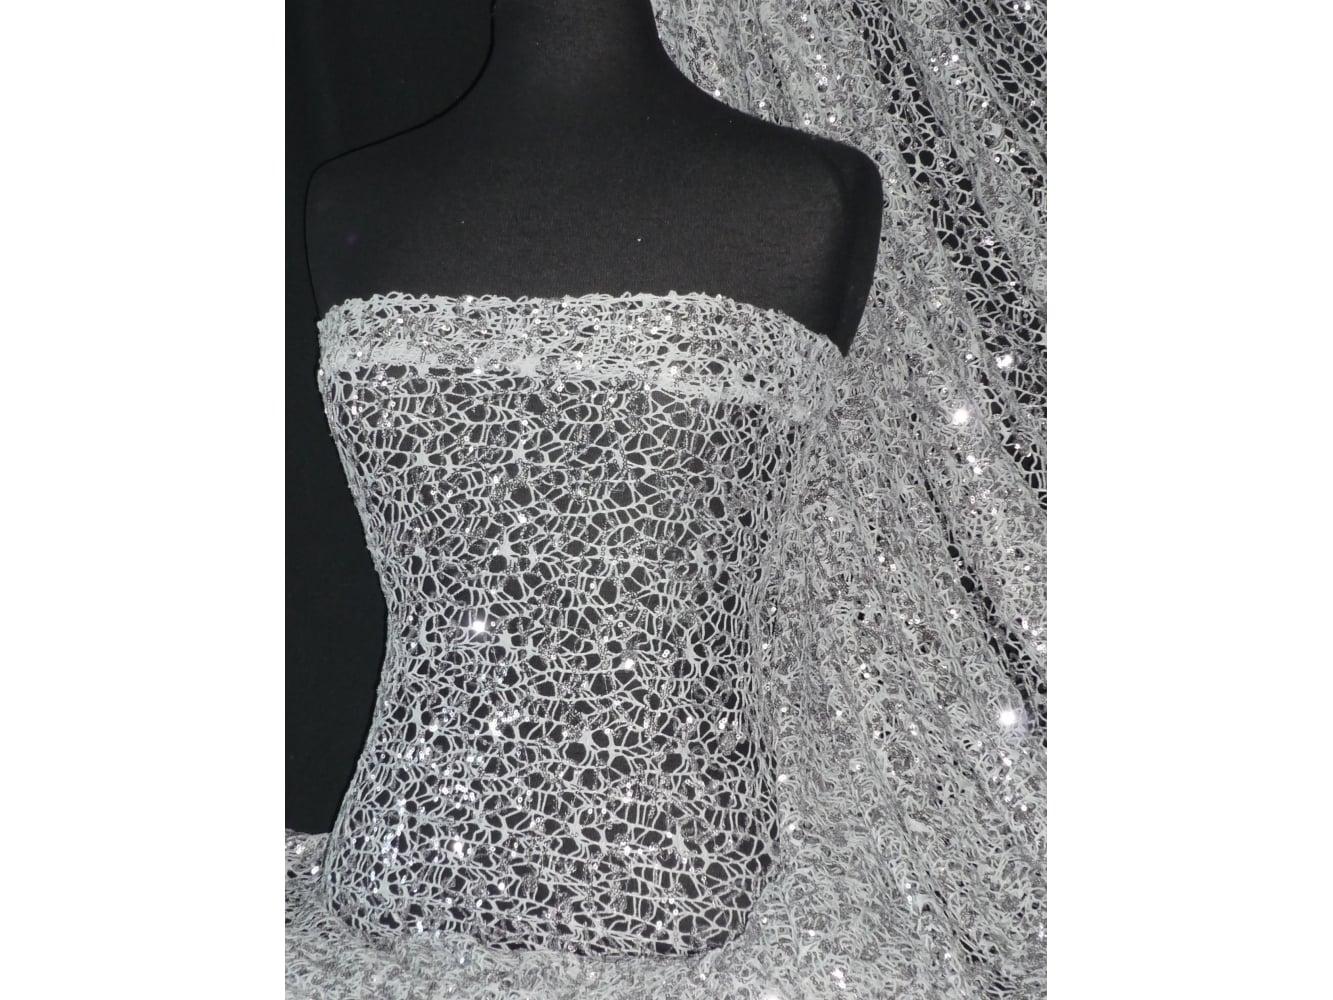 Crochet Knit Spider Web Sequin Lace Fabric- Ice Grey SQ158 IGR